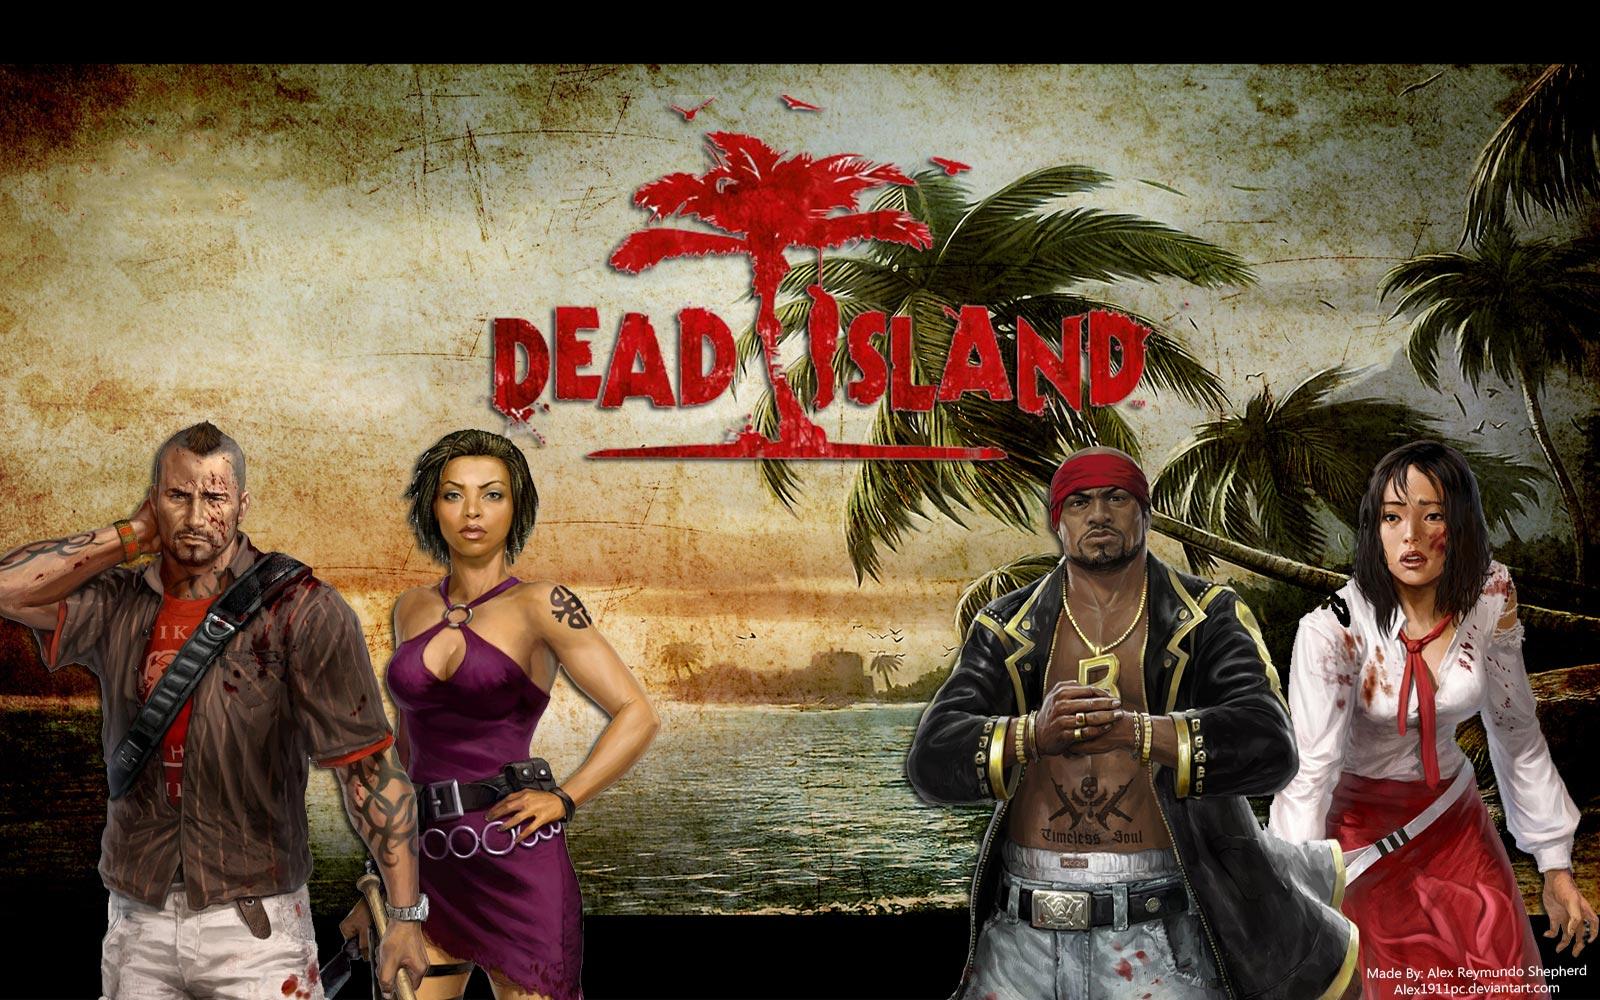 http://4.bp.blogspot.com/-9-_aVtlHGXk/UGAP76LehqI/AAAAAAAABEc/NgEV_81wx6I/s1600/scary+wallpaper+-+dead+island+wallpaper+5.jpg